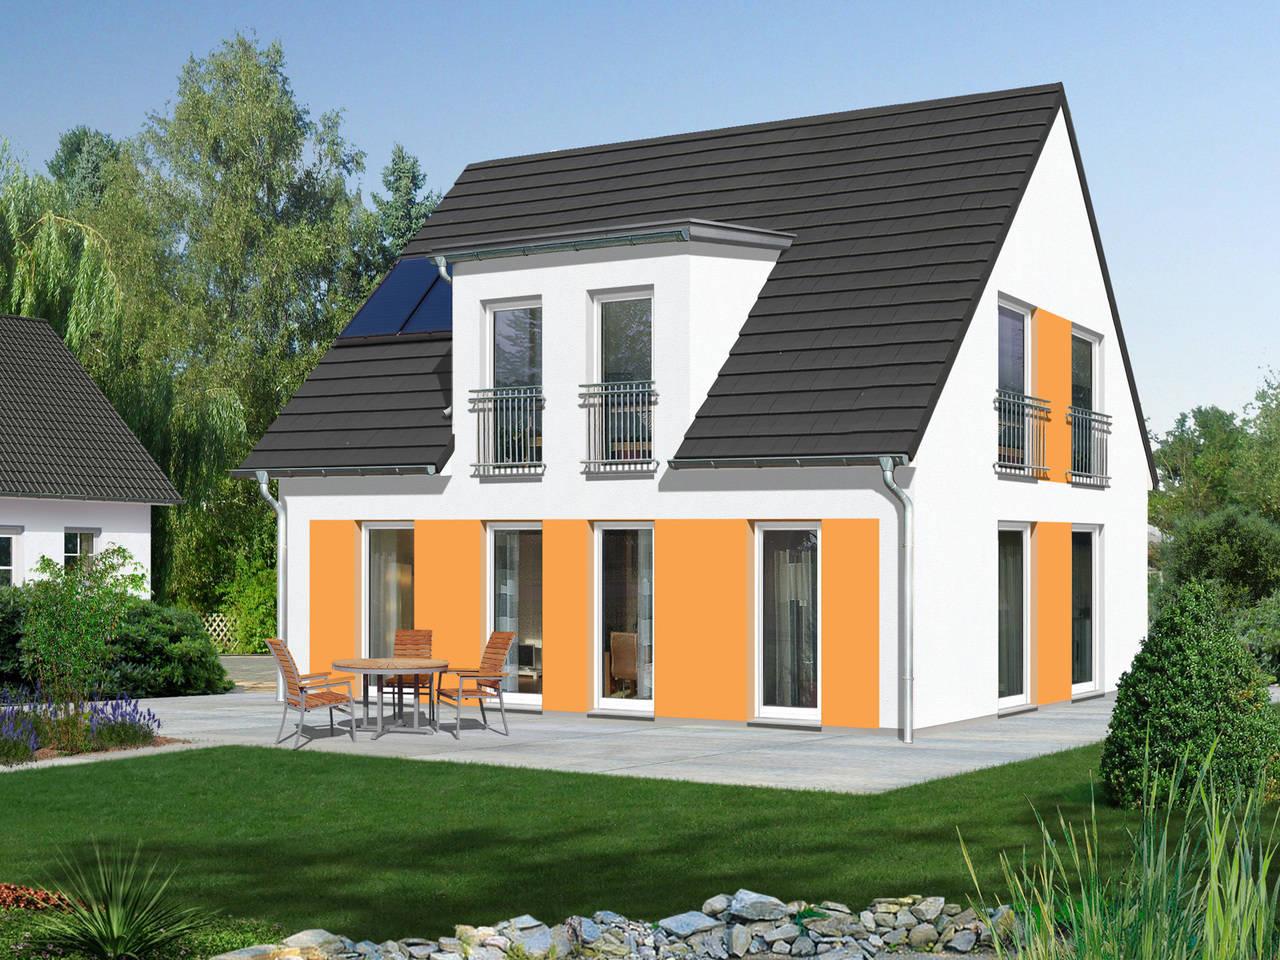 Haus Flair 113 Trend von Nico Jacobs Eigenheimbau - Town & Country Partner